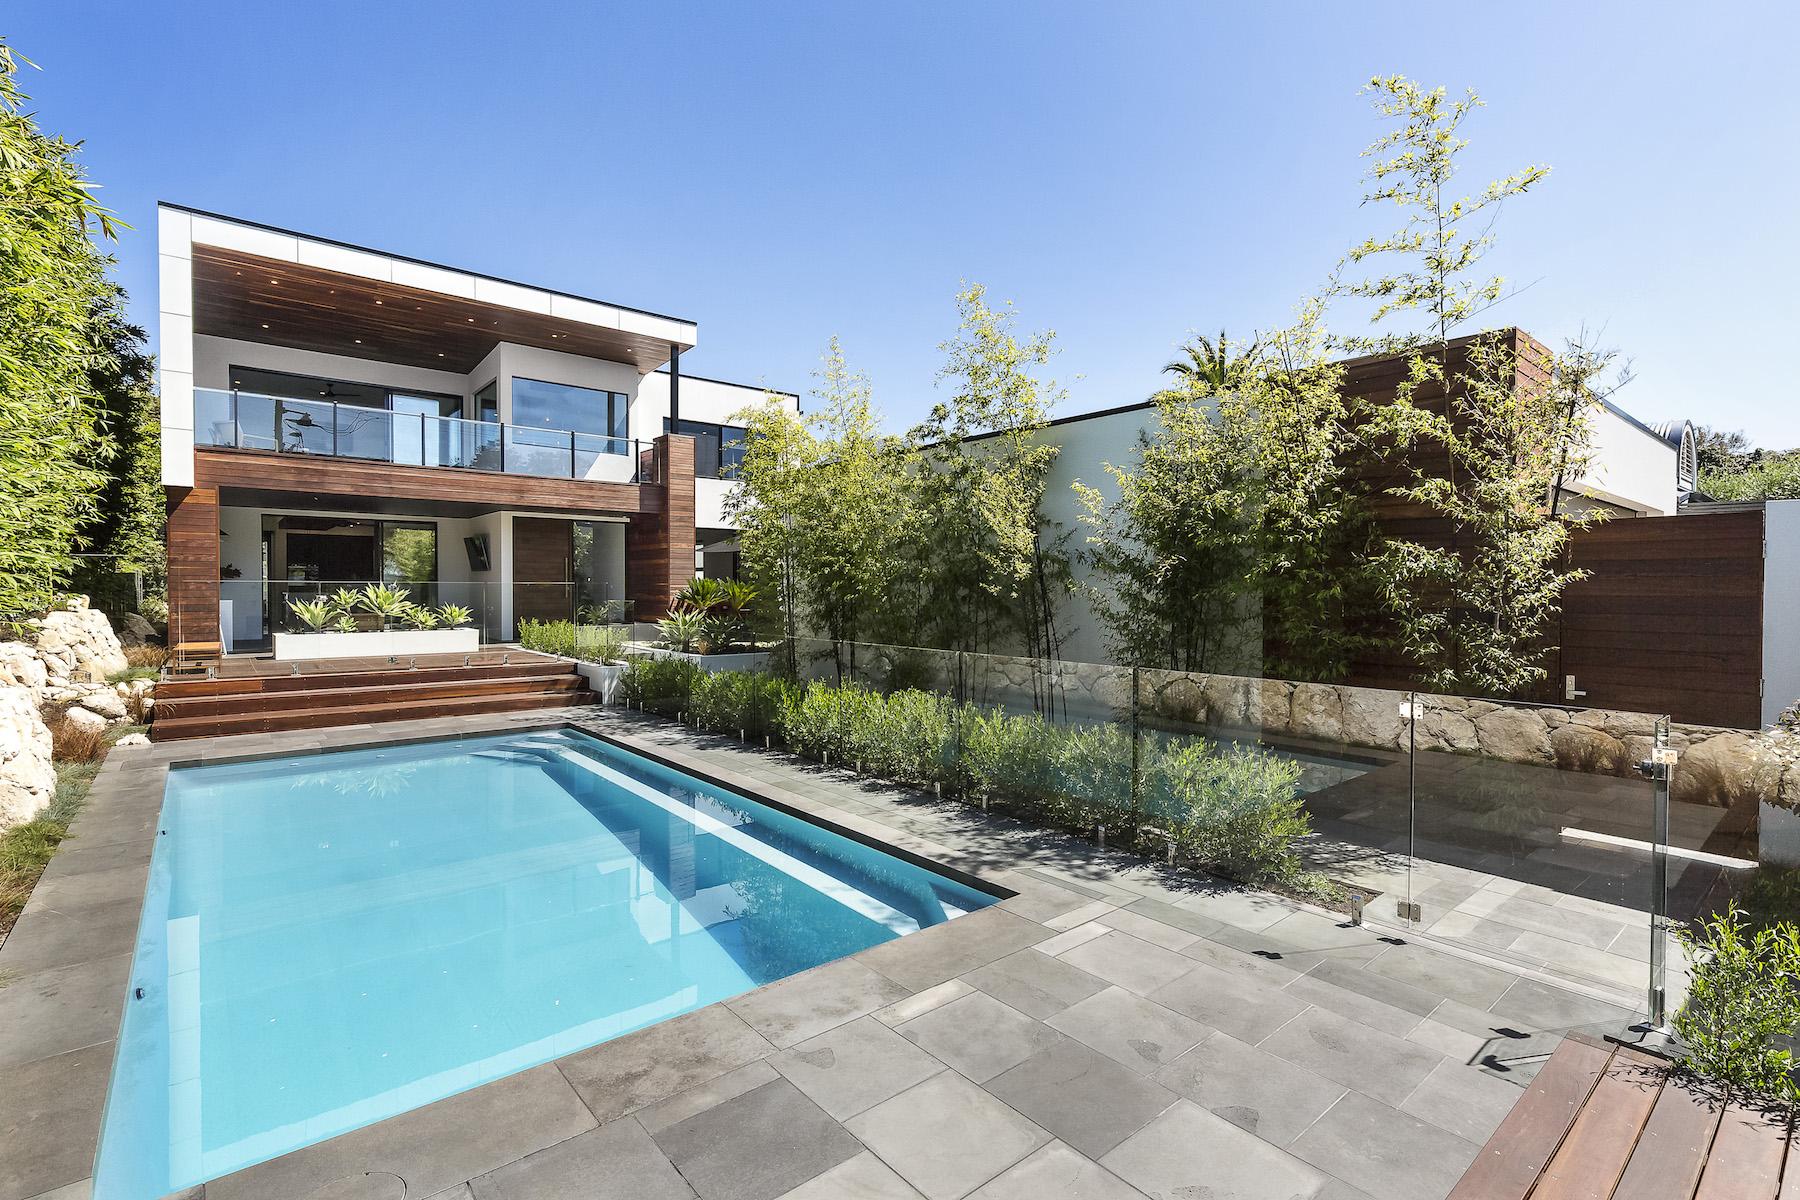 Tek Ailelik Ev için Satış at 2983 Point Nepean Road, Blairgowrie Blairgowrie, Victoria, 3942 Avustralya